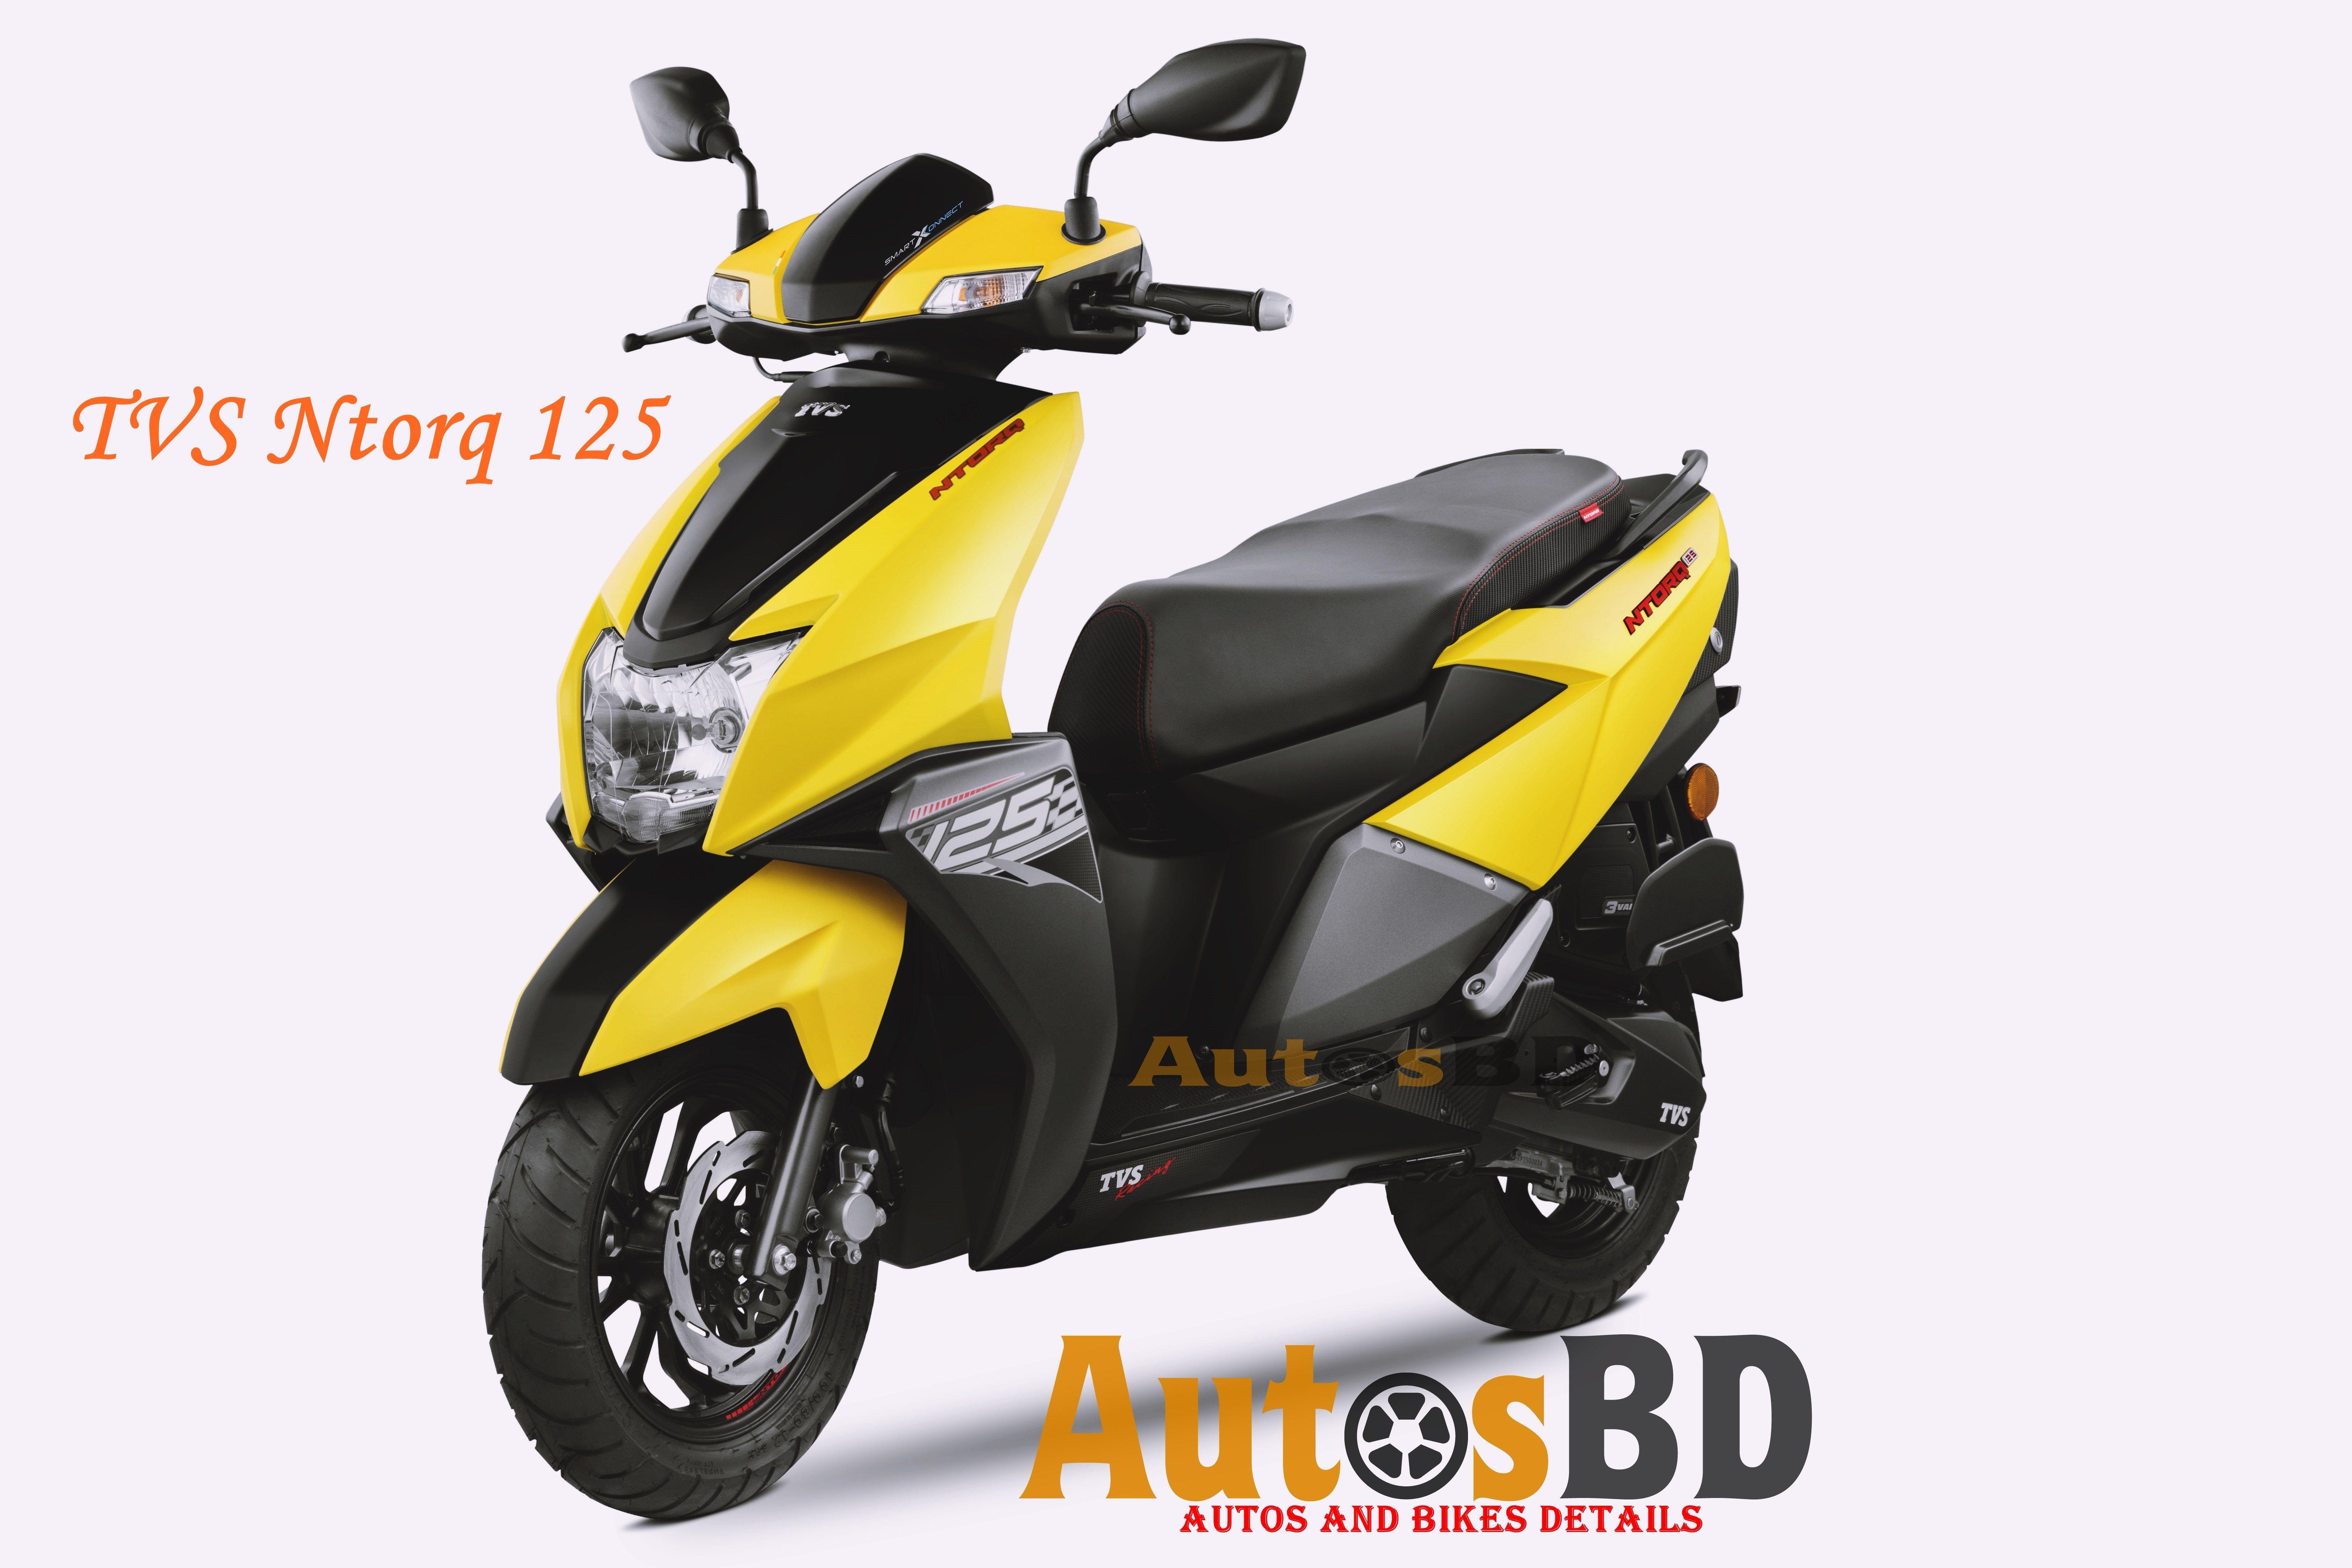 Tvs Ntorq 125 Specification Bike Design Tyre Size Led Tail Lights